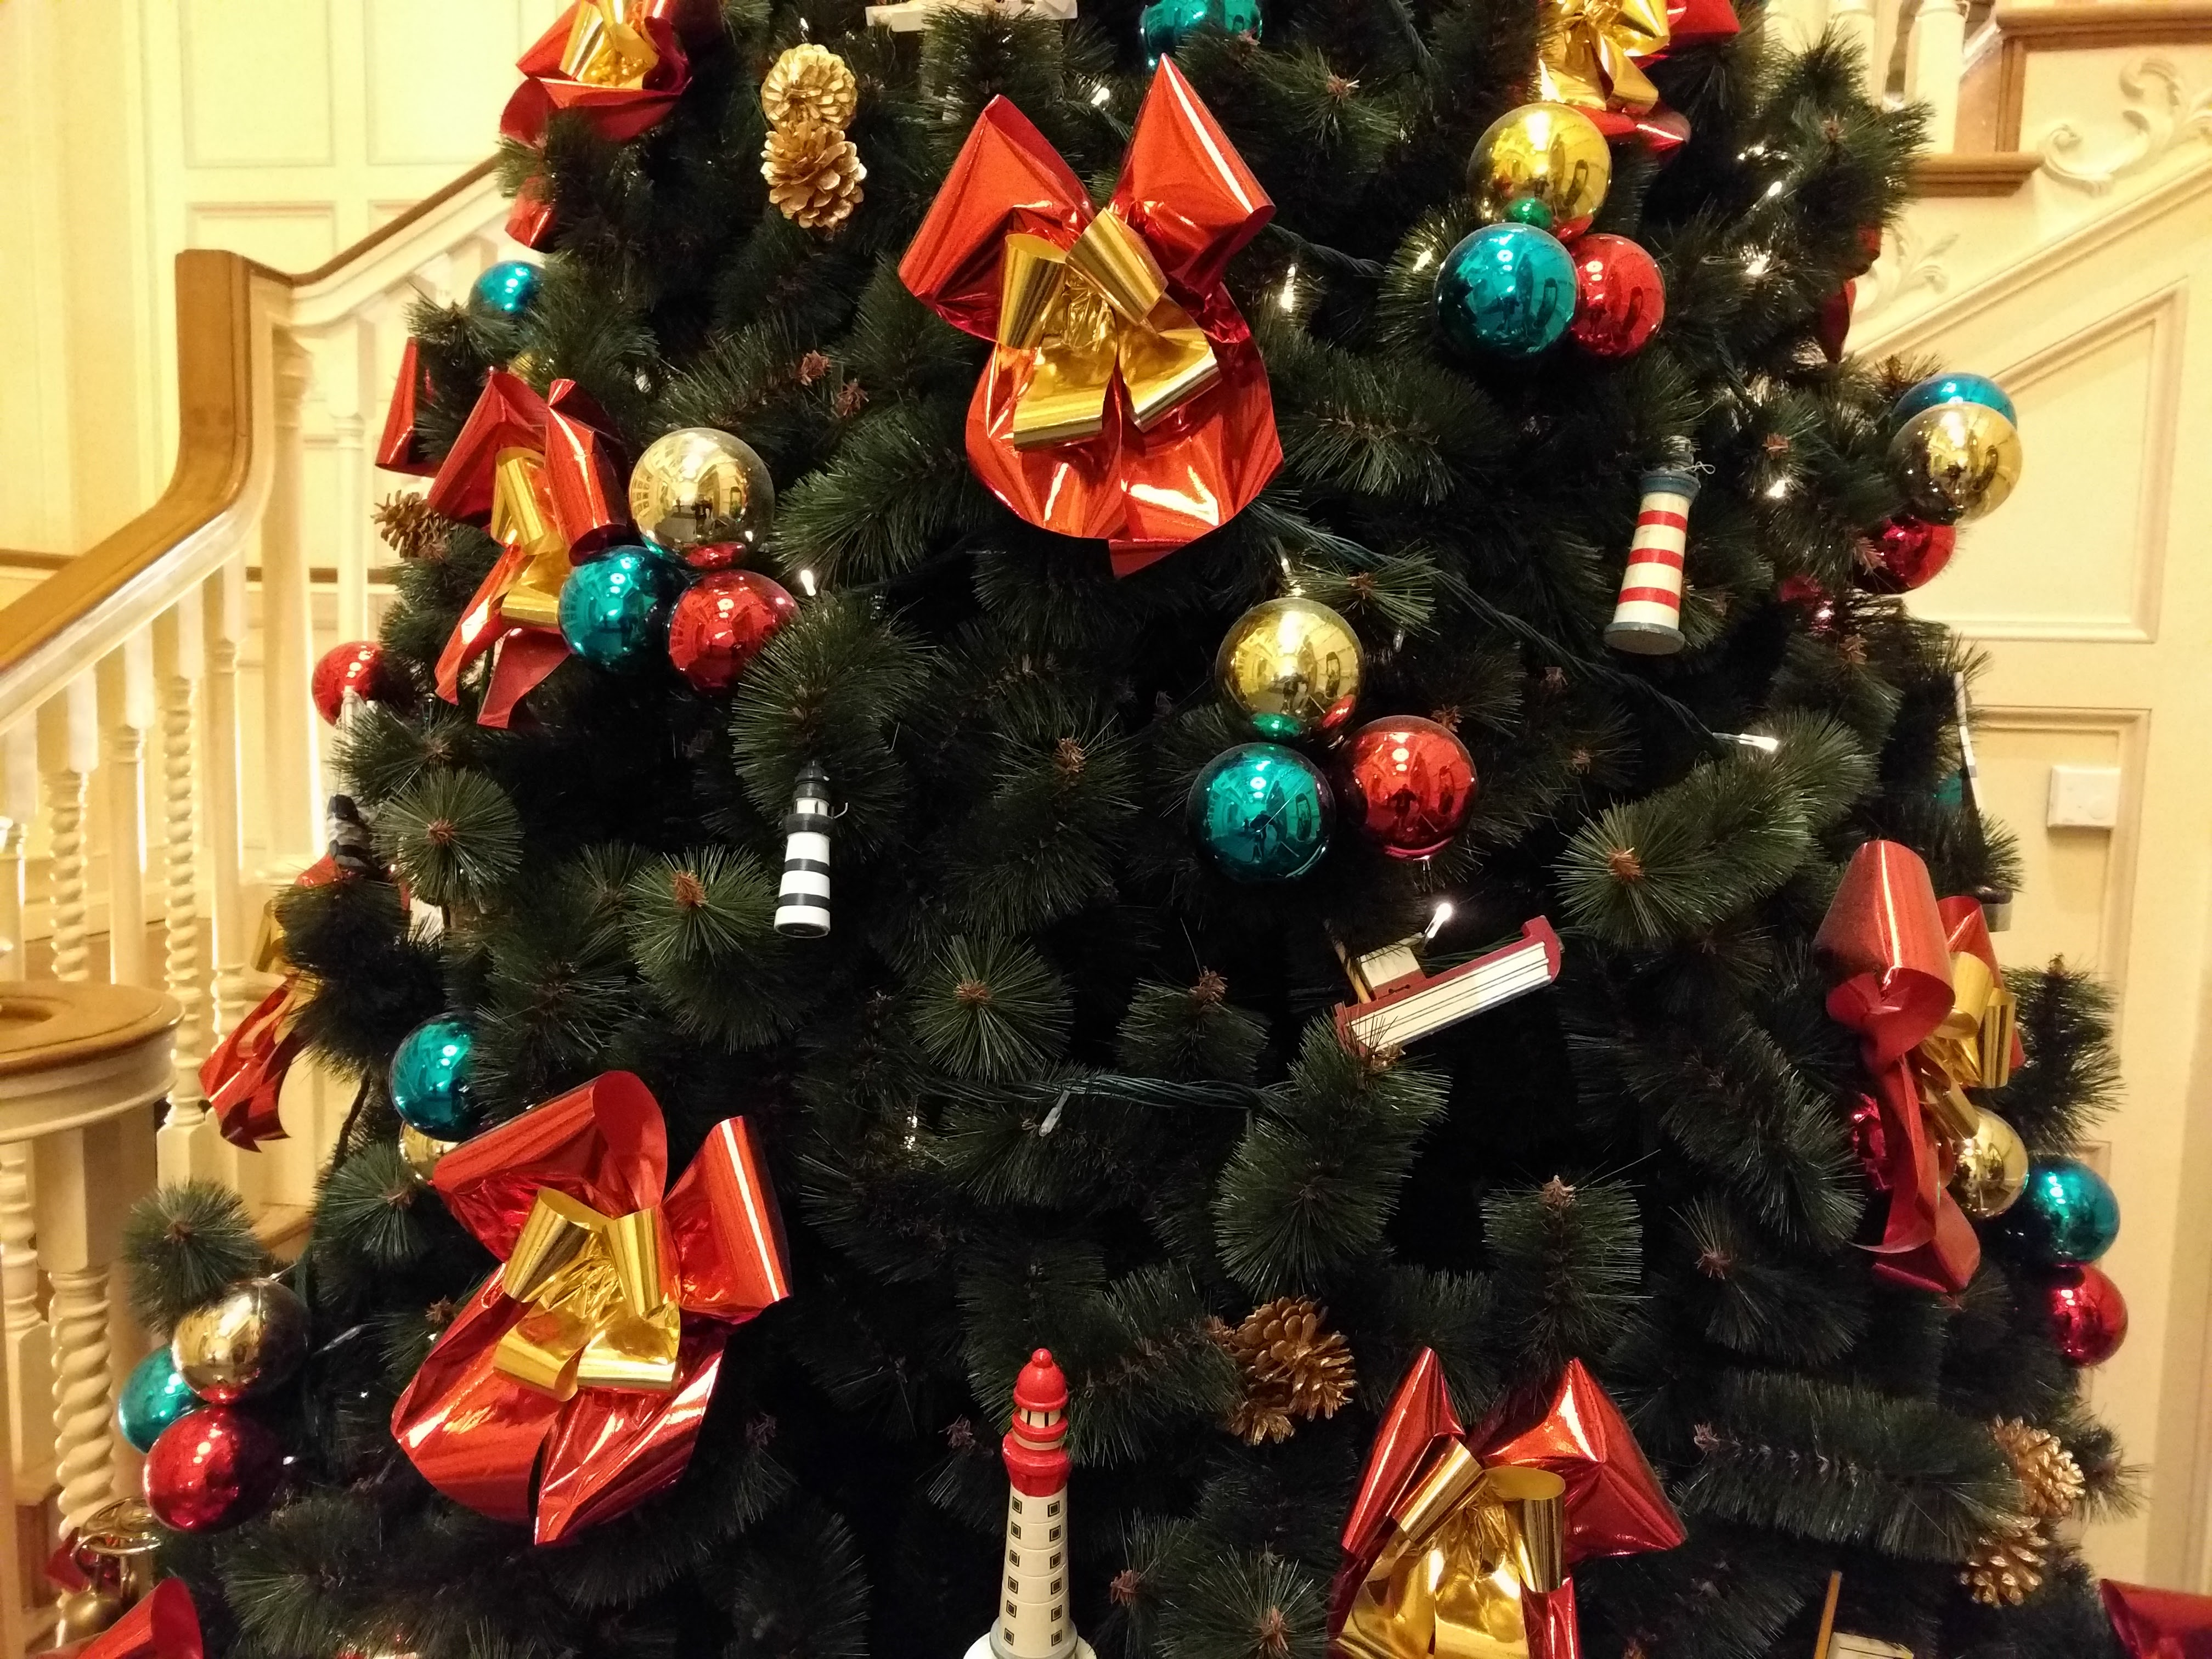 Highlight Christmas Disneyland Paris 2016 - Travel to the Magic